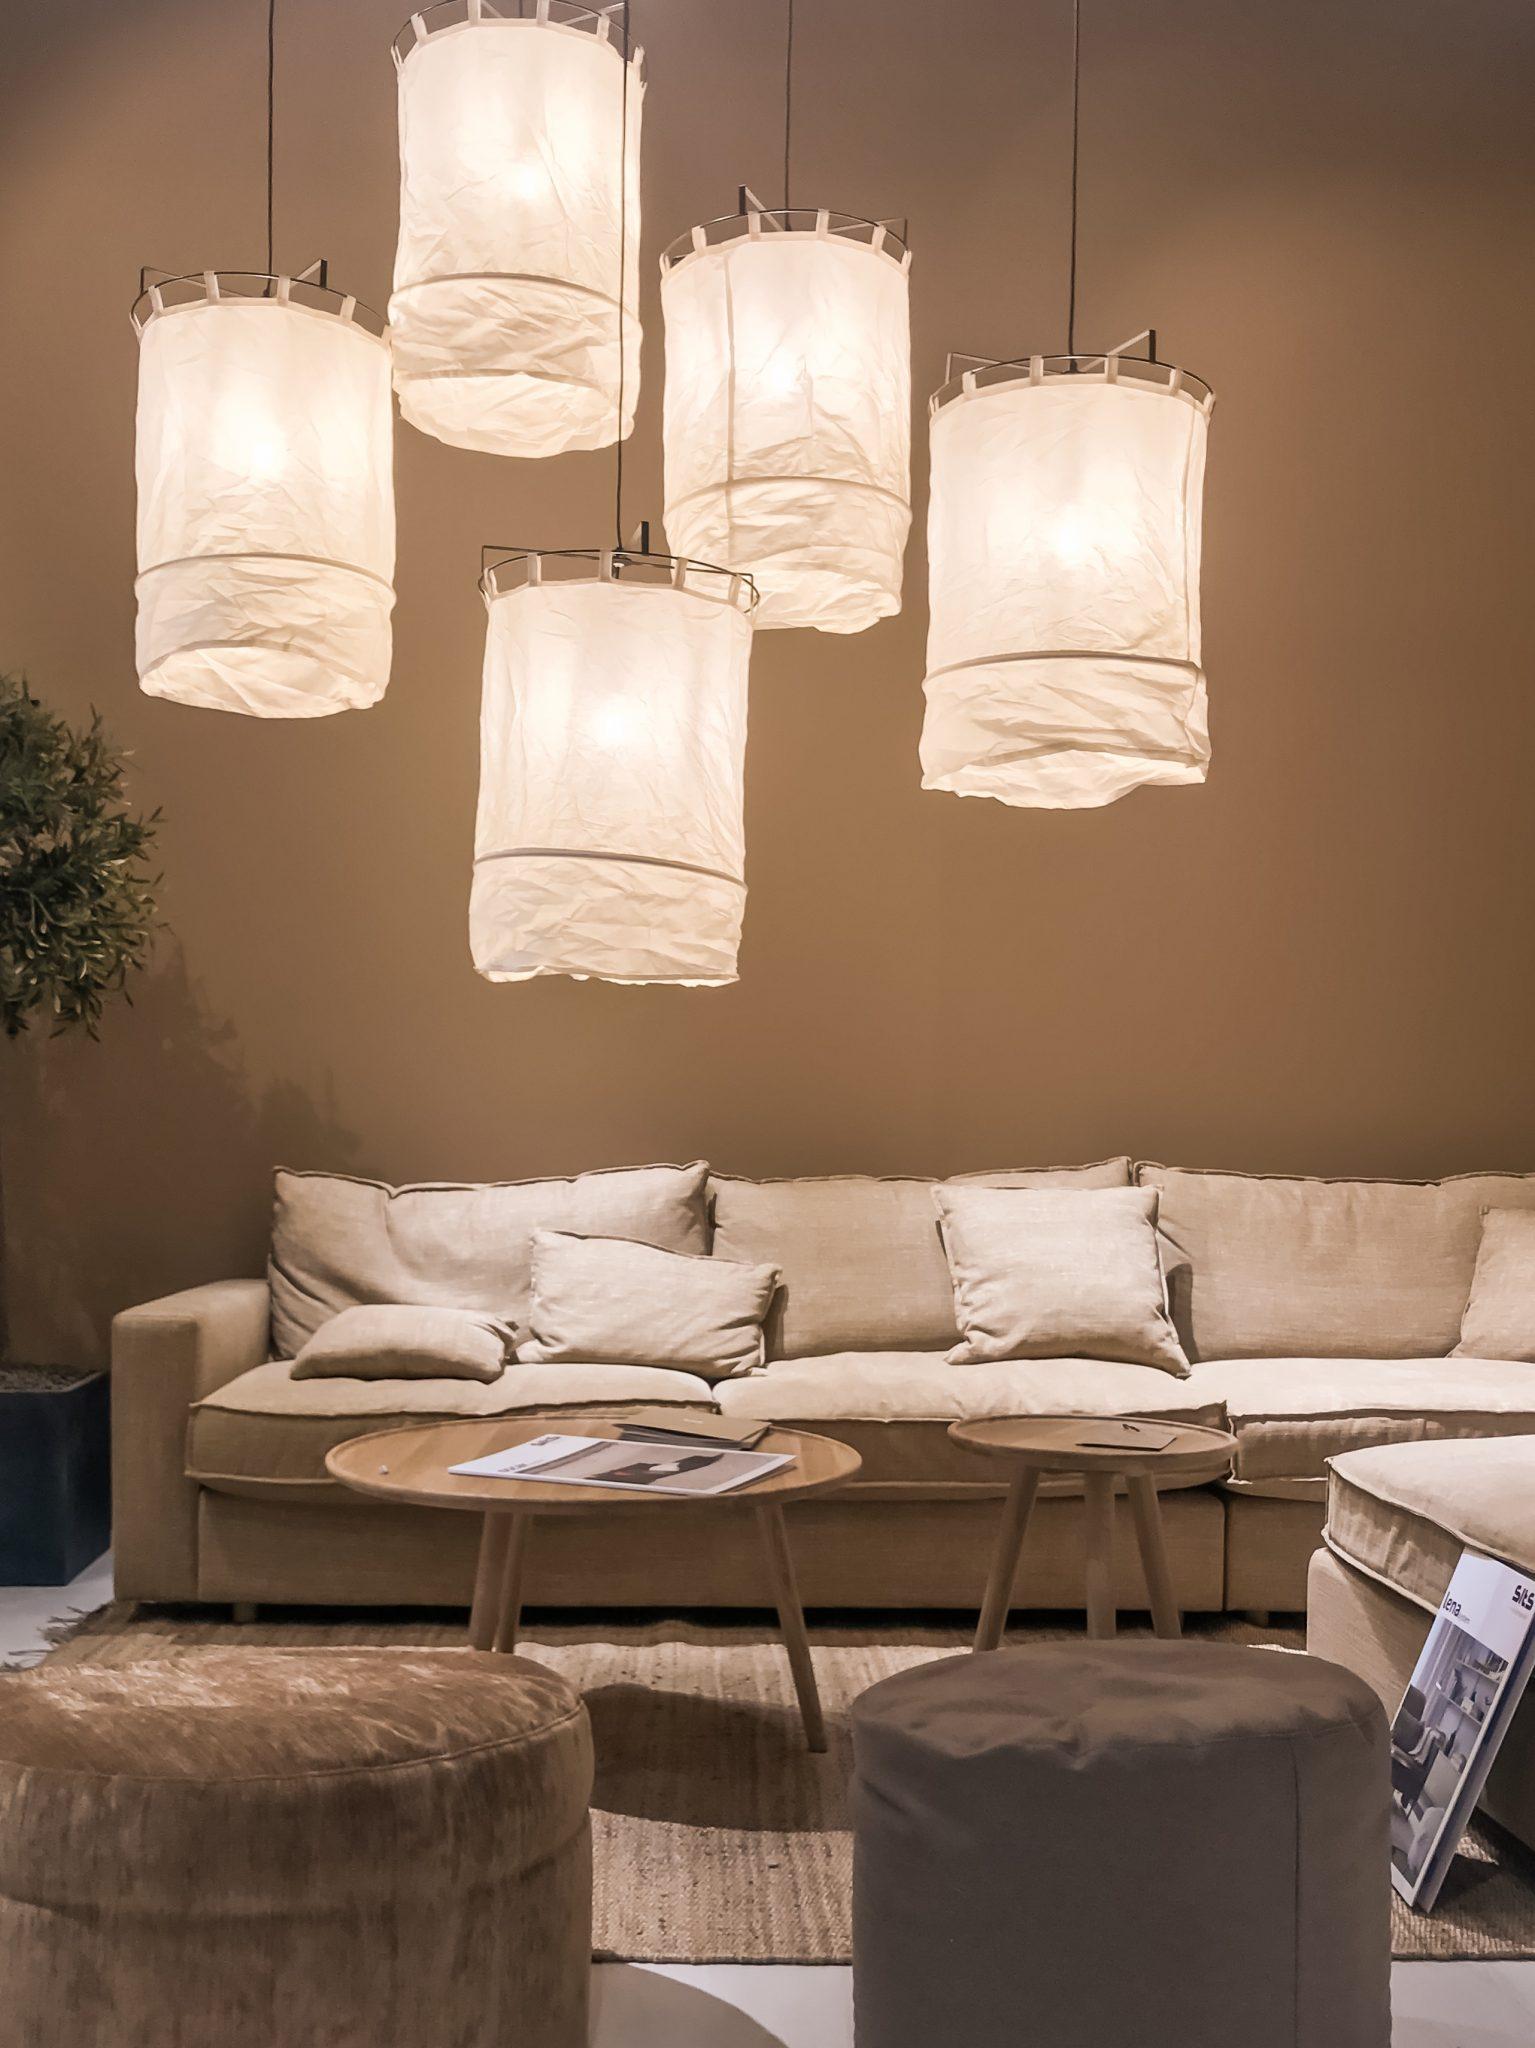 Maison and Objet Paris - Interior trends